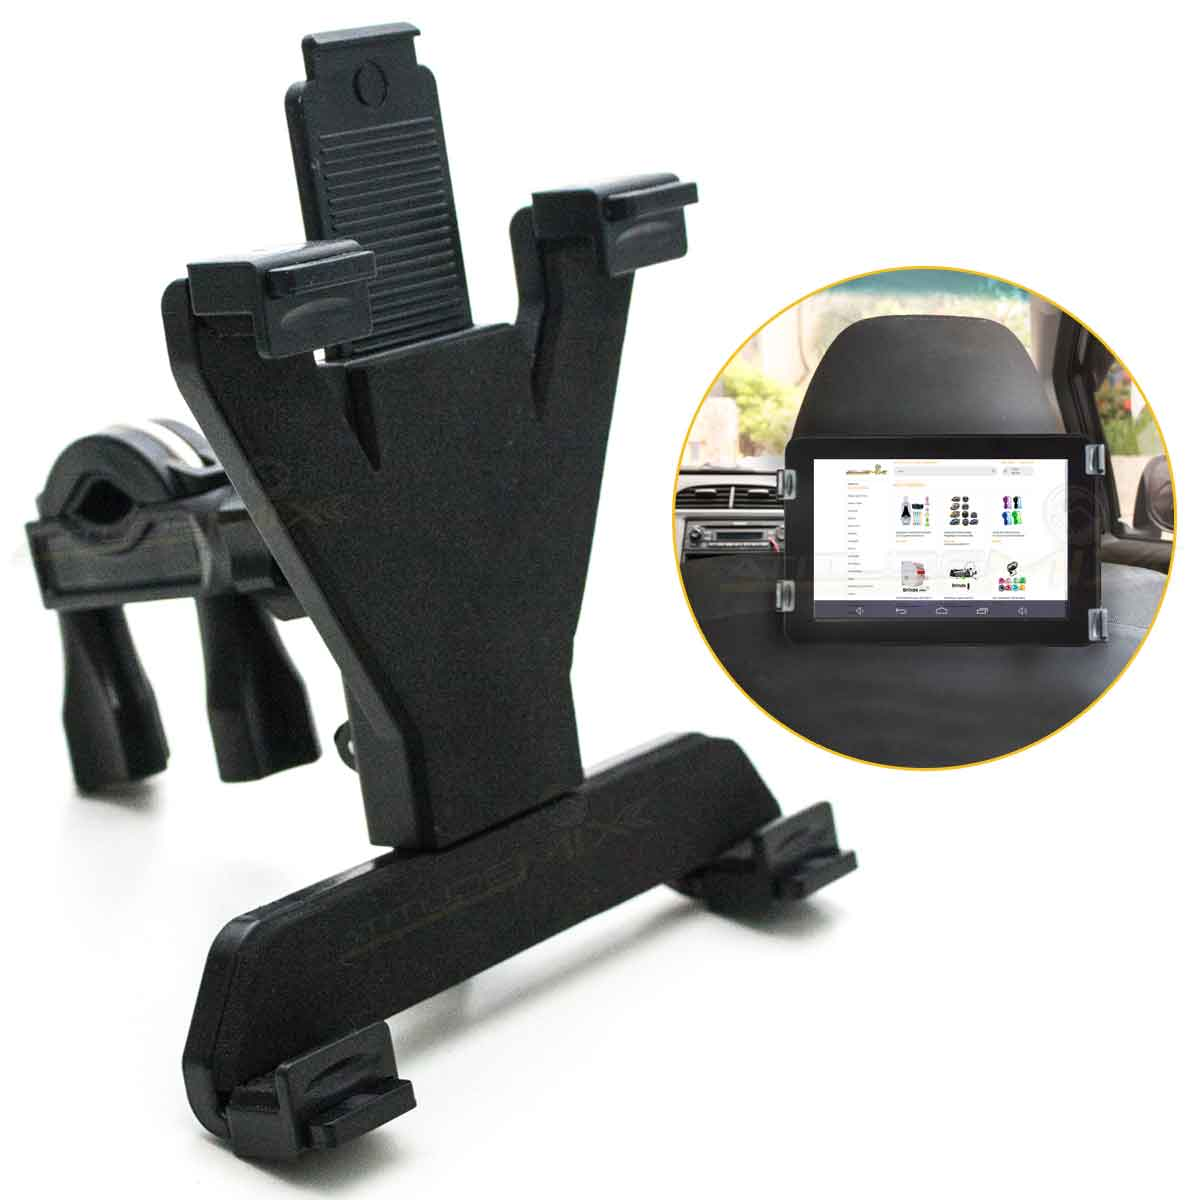 Suporte Tablet Pedestal Microfone Encosto Cabeça Carro Ipad